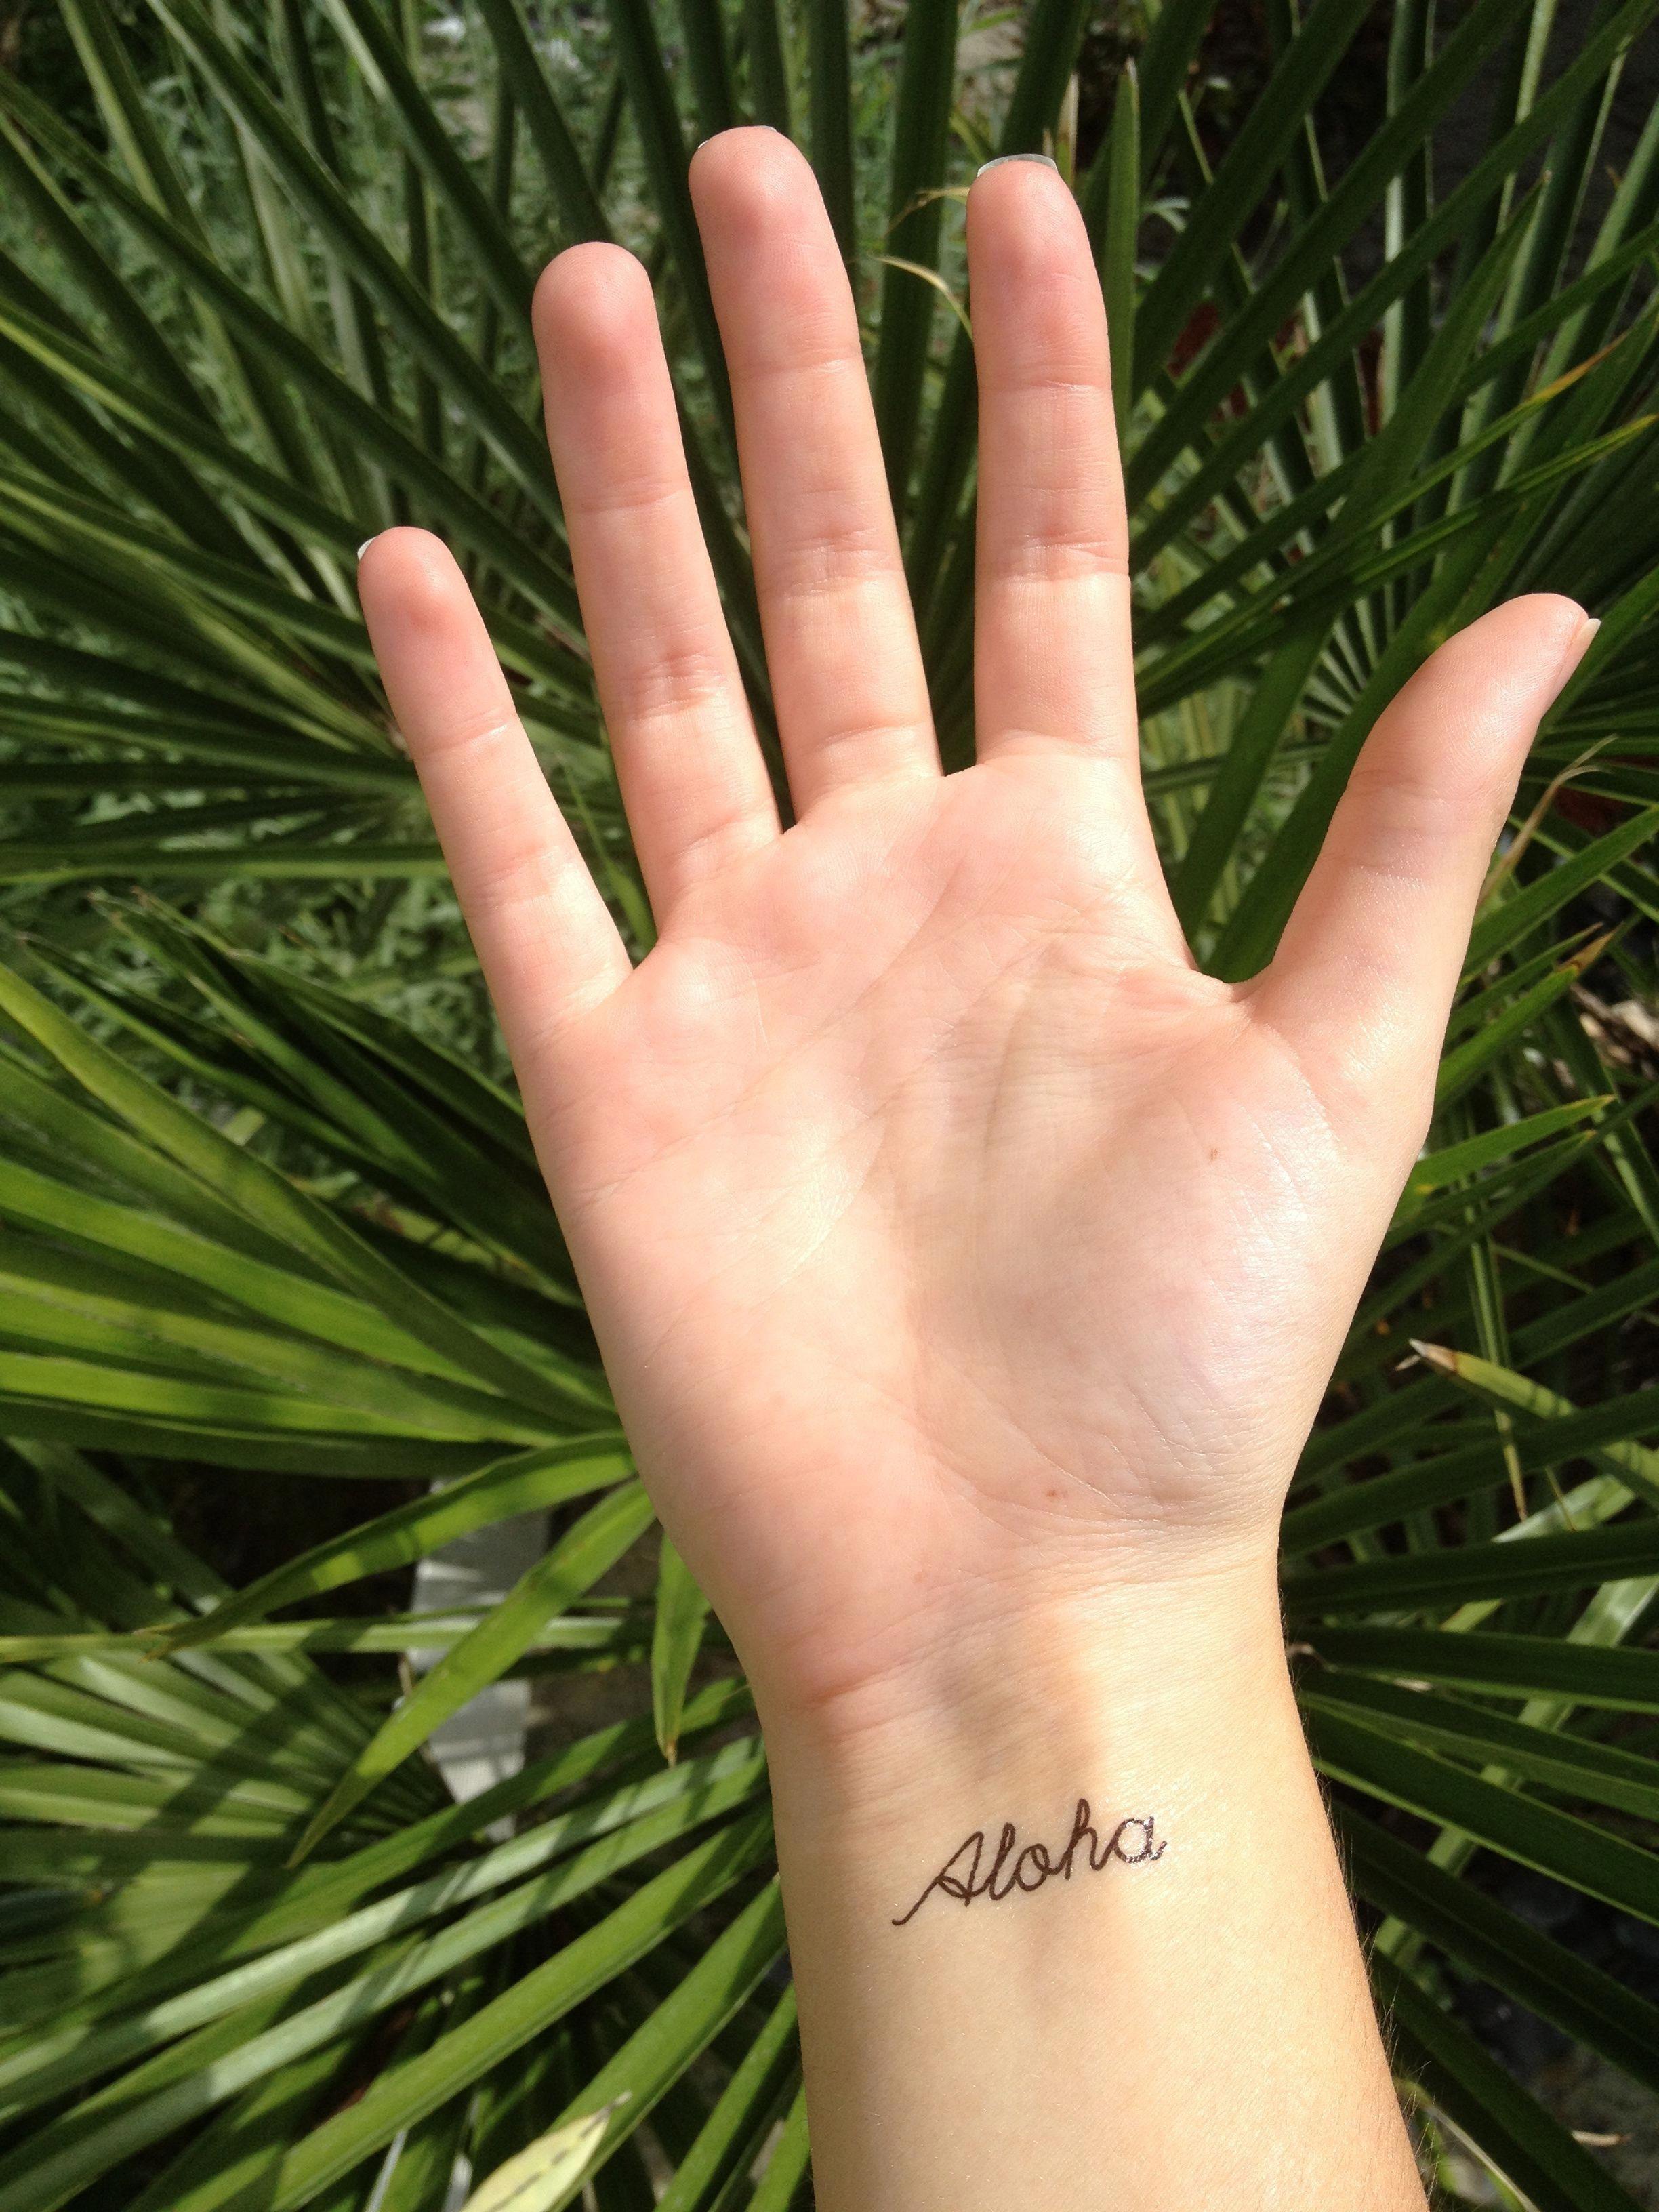 Aloha ephemeral tattoo skin feelings good vibes only live